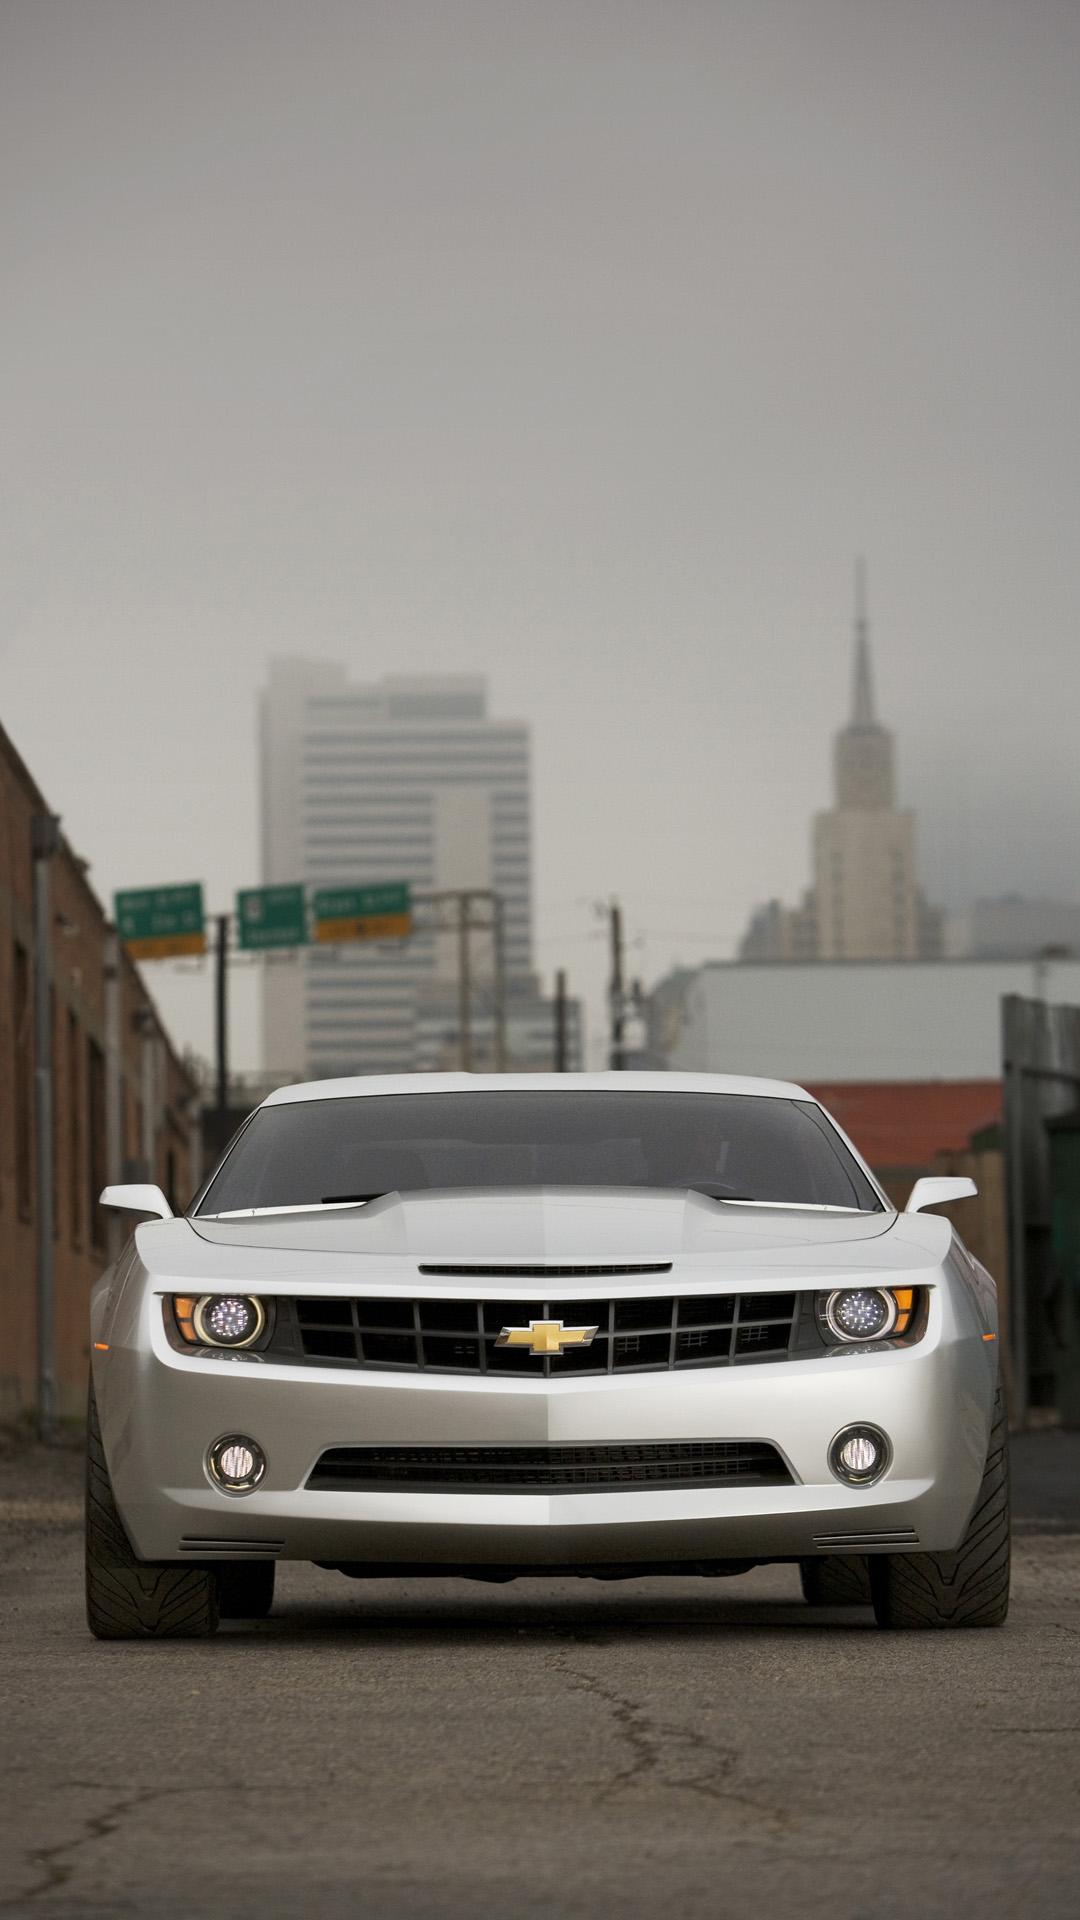 Chevrolet Camaro htc one wallpaper